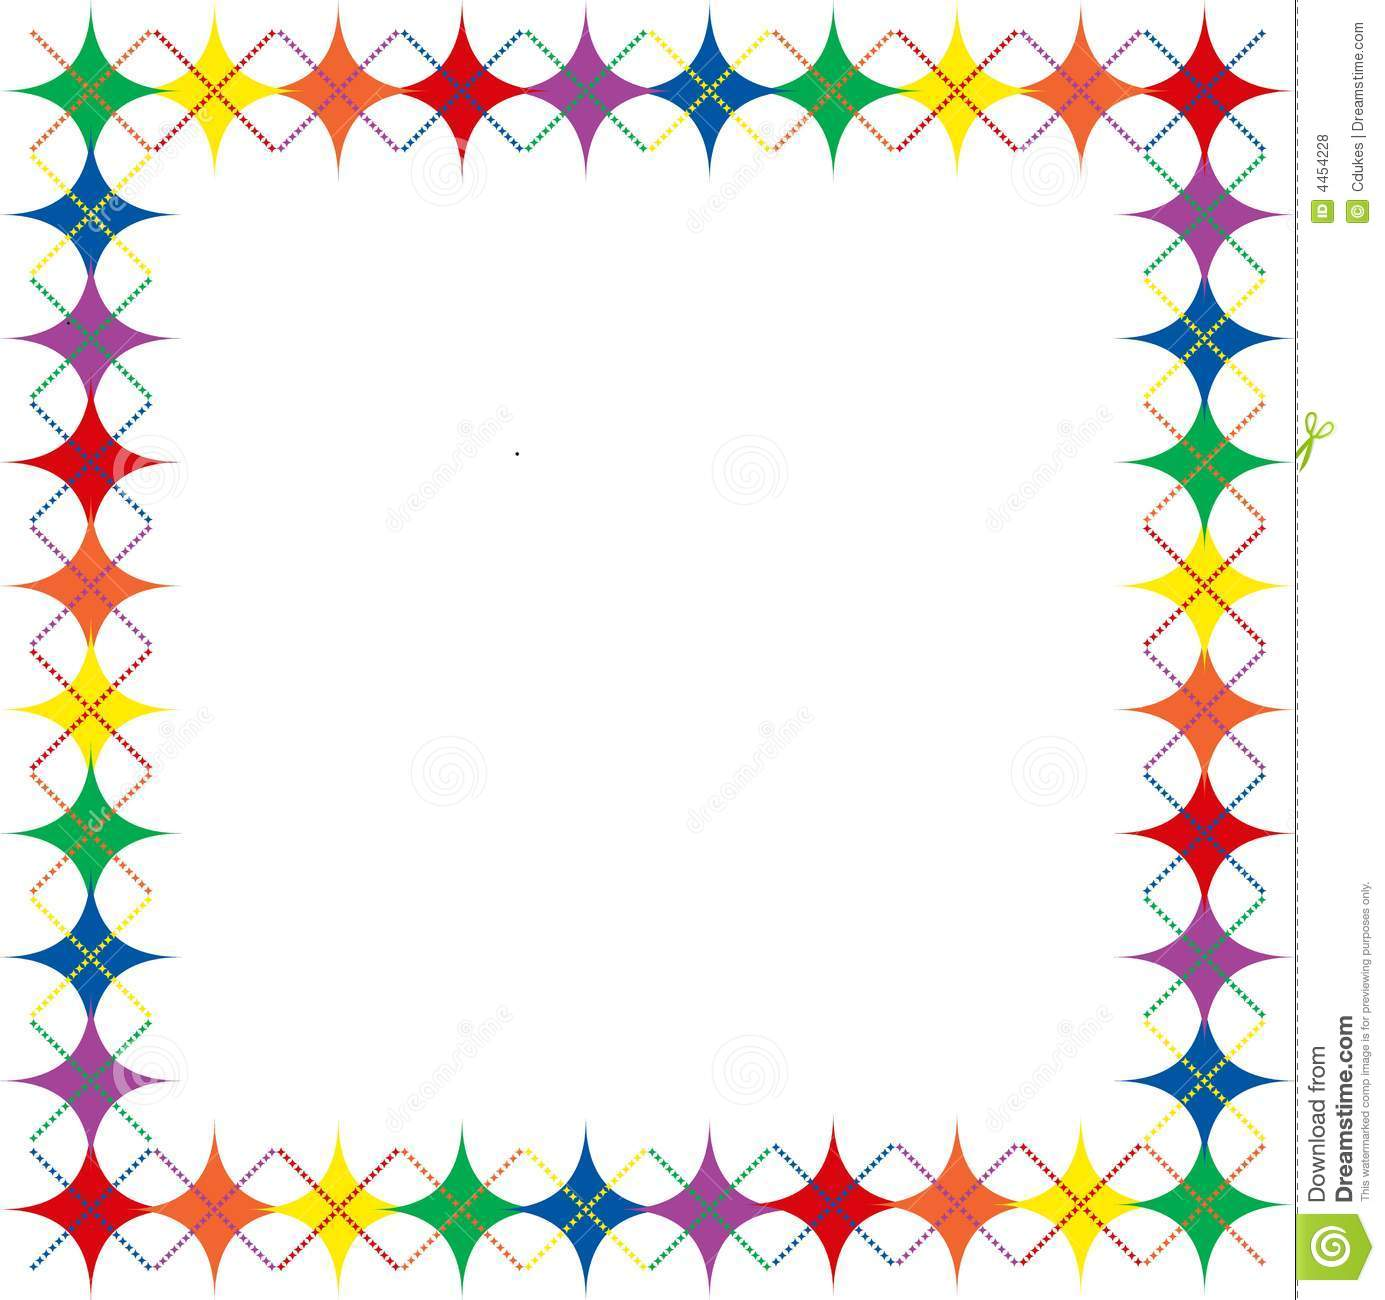 Yellow U003cbu003eStar Border Clip Art C-Yellow u003cbu003eStar Border Clip Art Clipartu003c/bu003e Panda Free u003cbu003eClipartu003c/bu003e Images-19